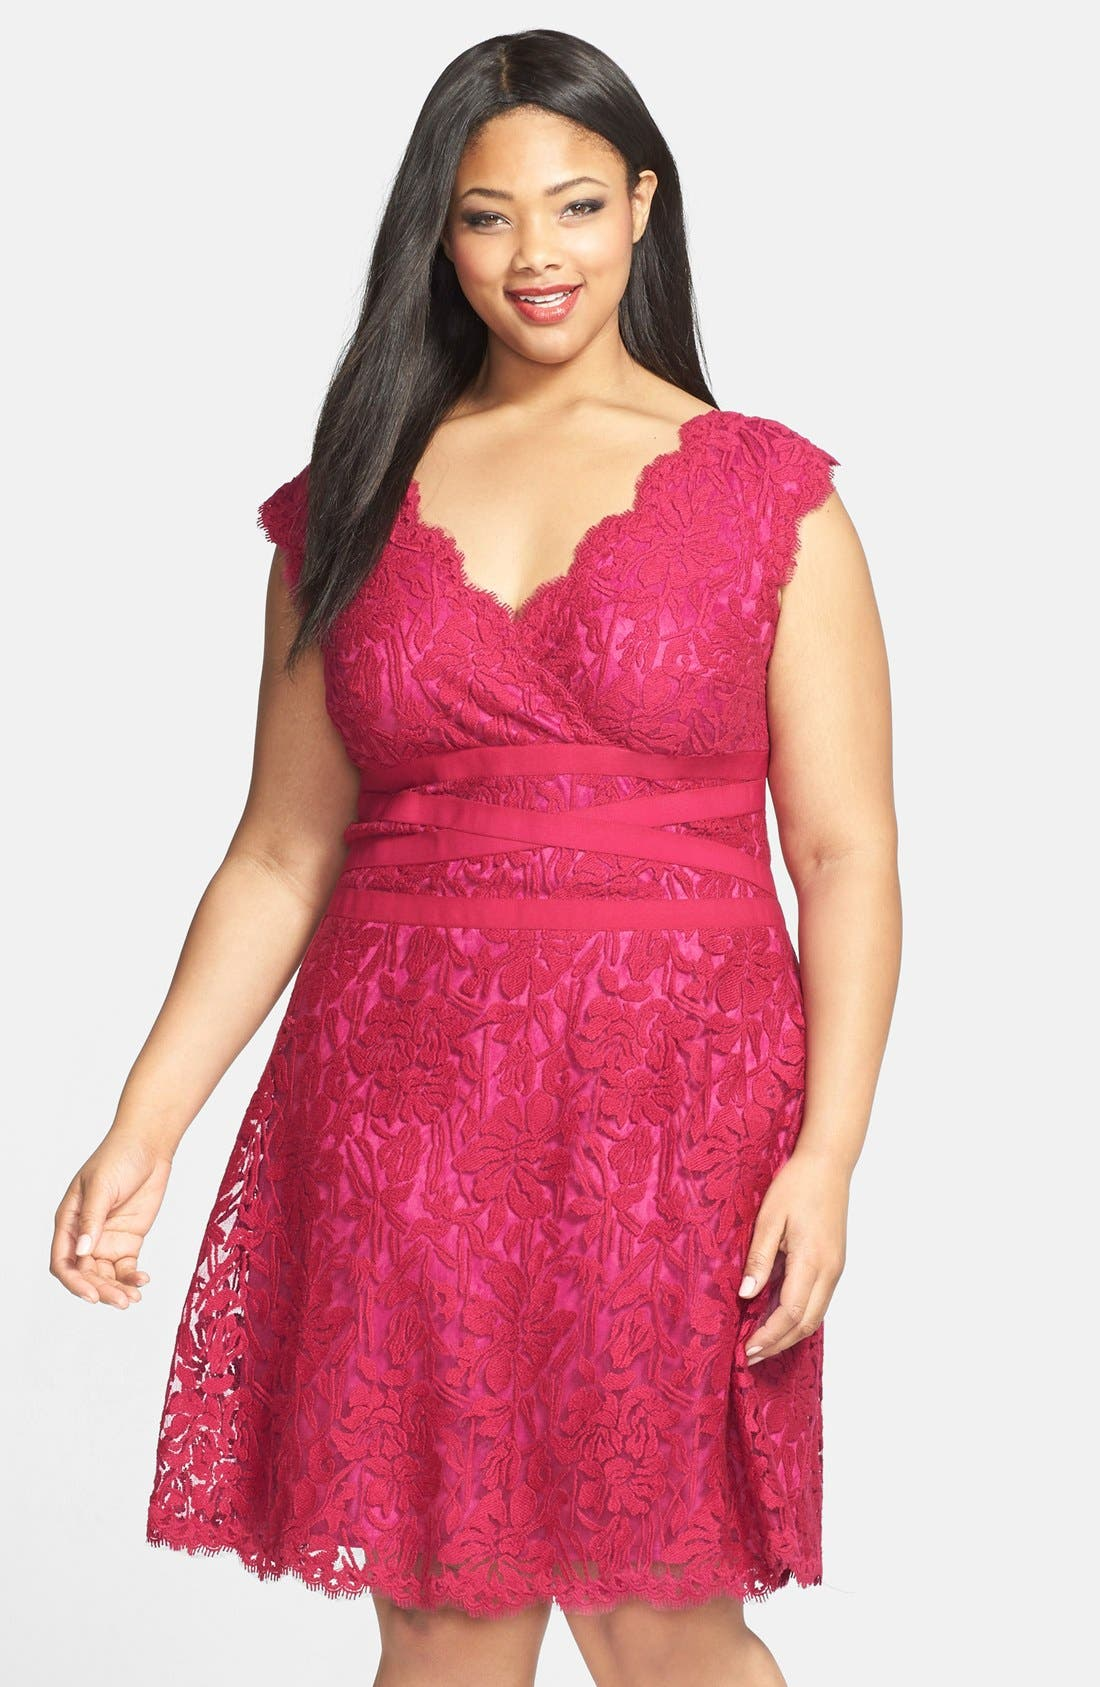 Alternate Image 1 Selected - Tadashi Shoji Embroidered Lace Fit & Flare Dress (Plus Size)